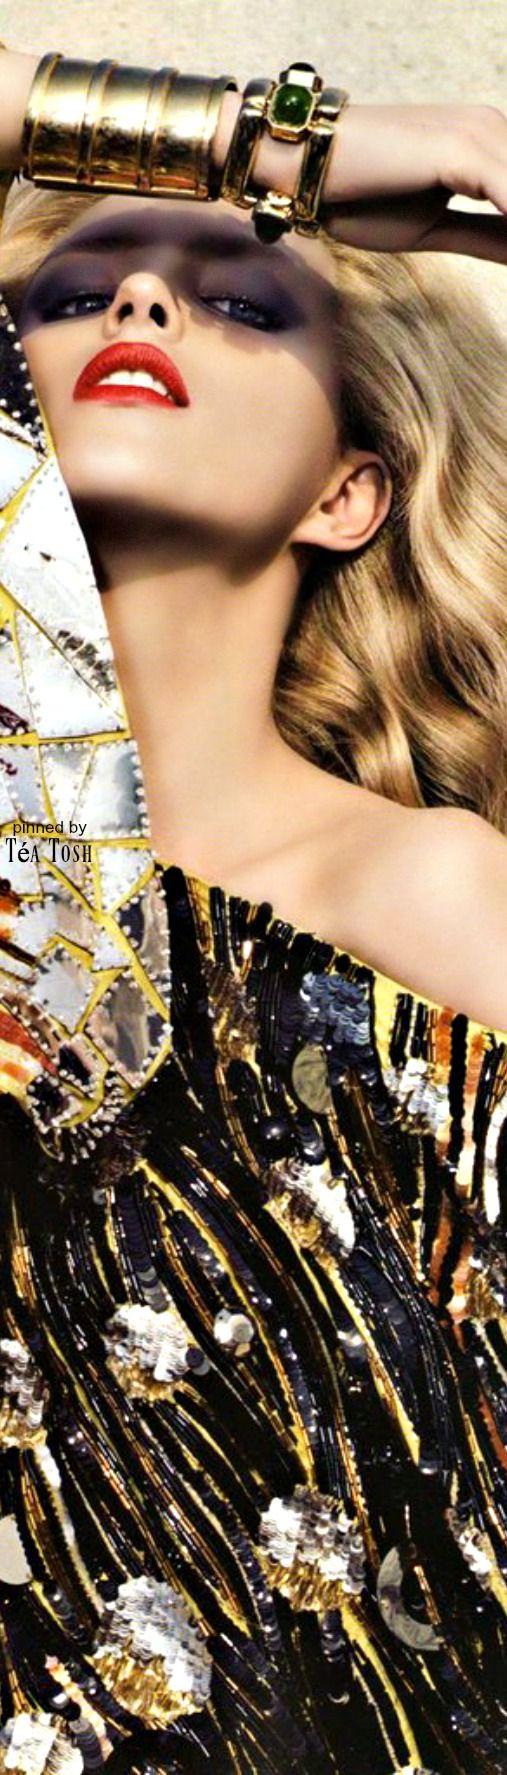 Téa Tosh Black and gold | Suzie J Brosseau | Gold fashion ...